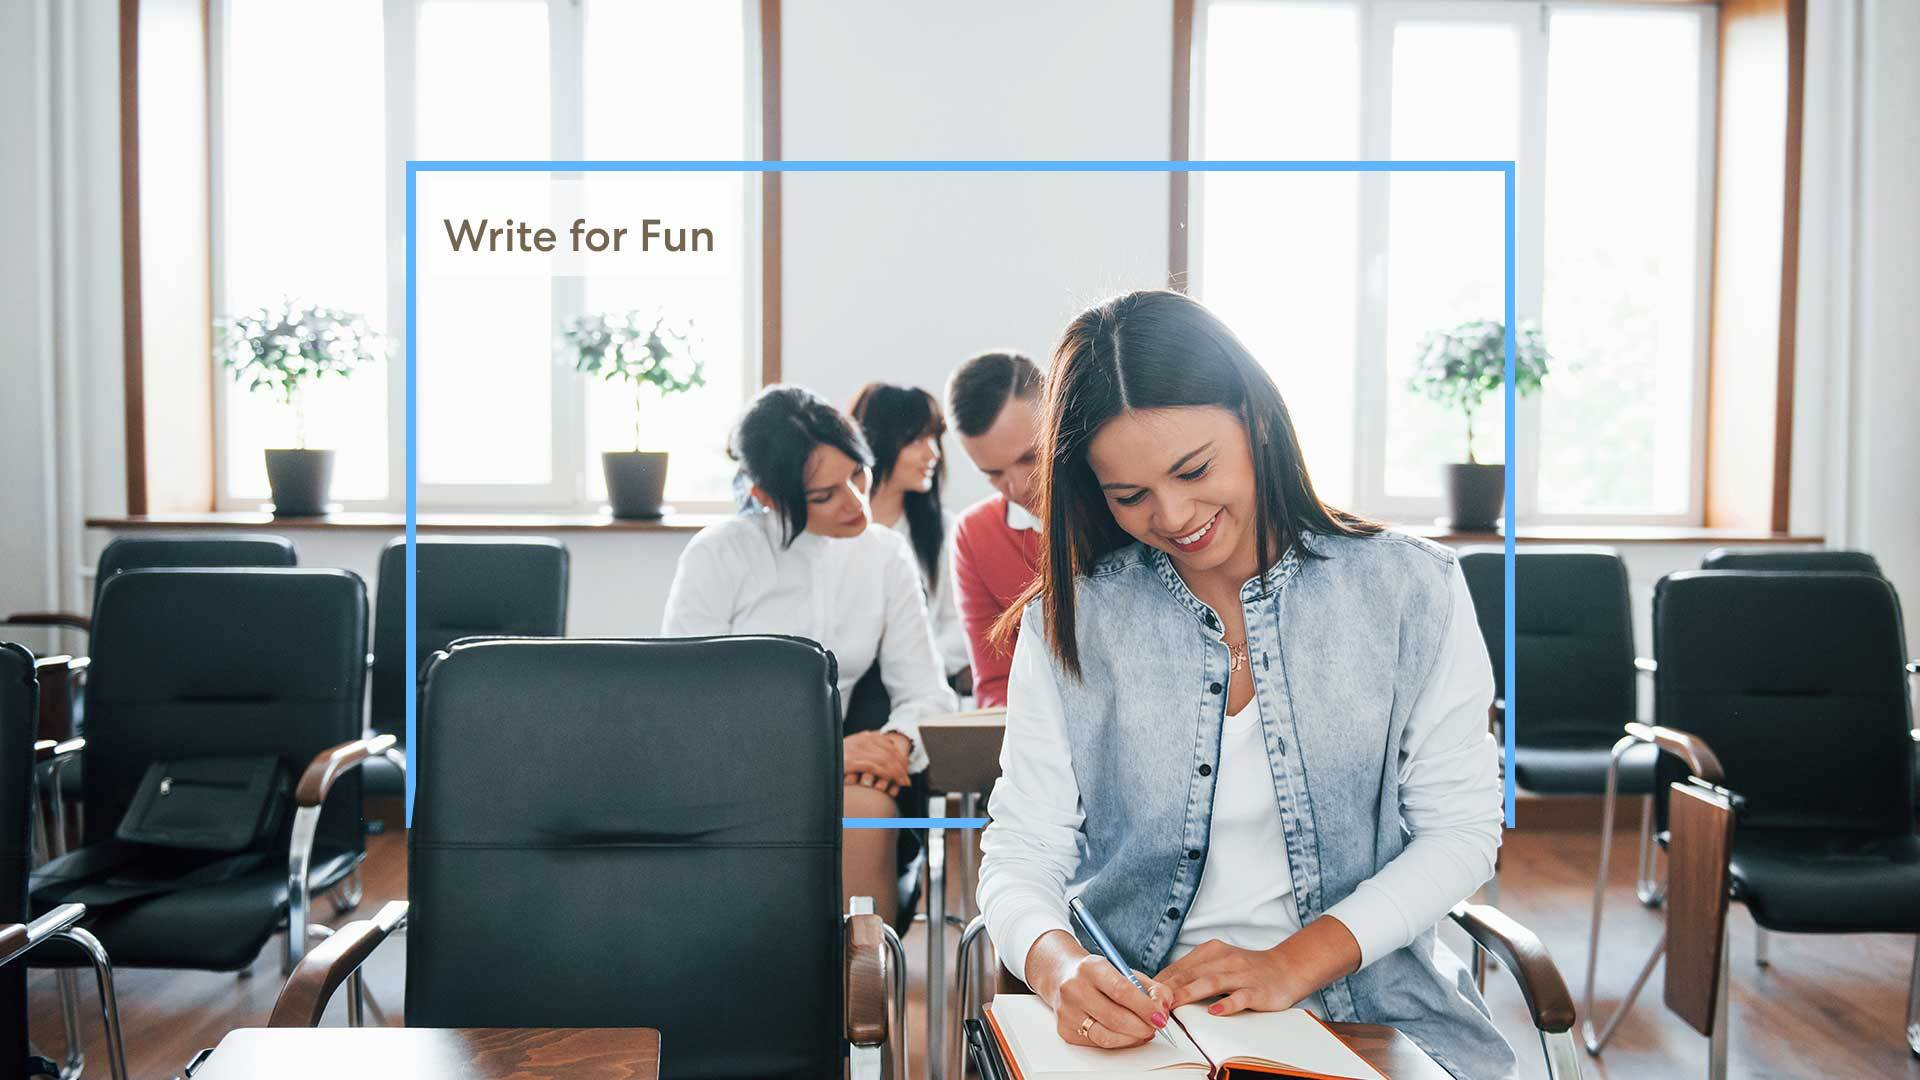 Photo of Write for fun